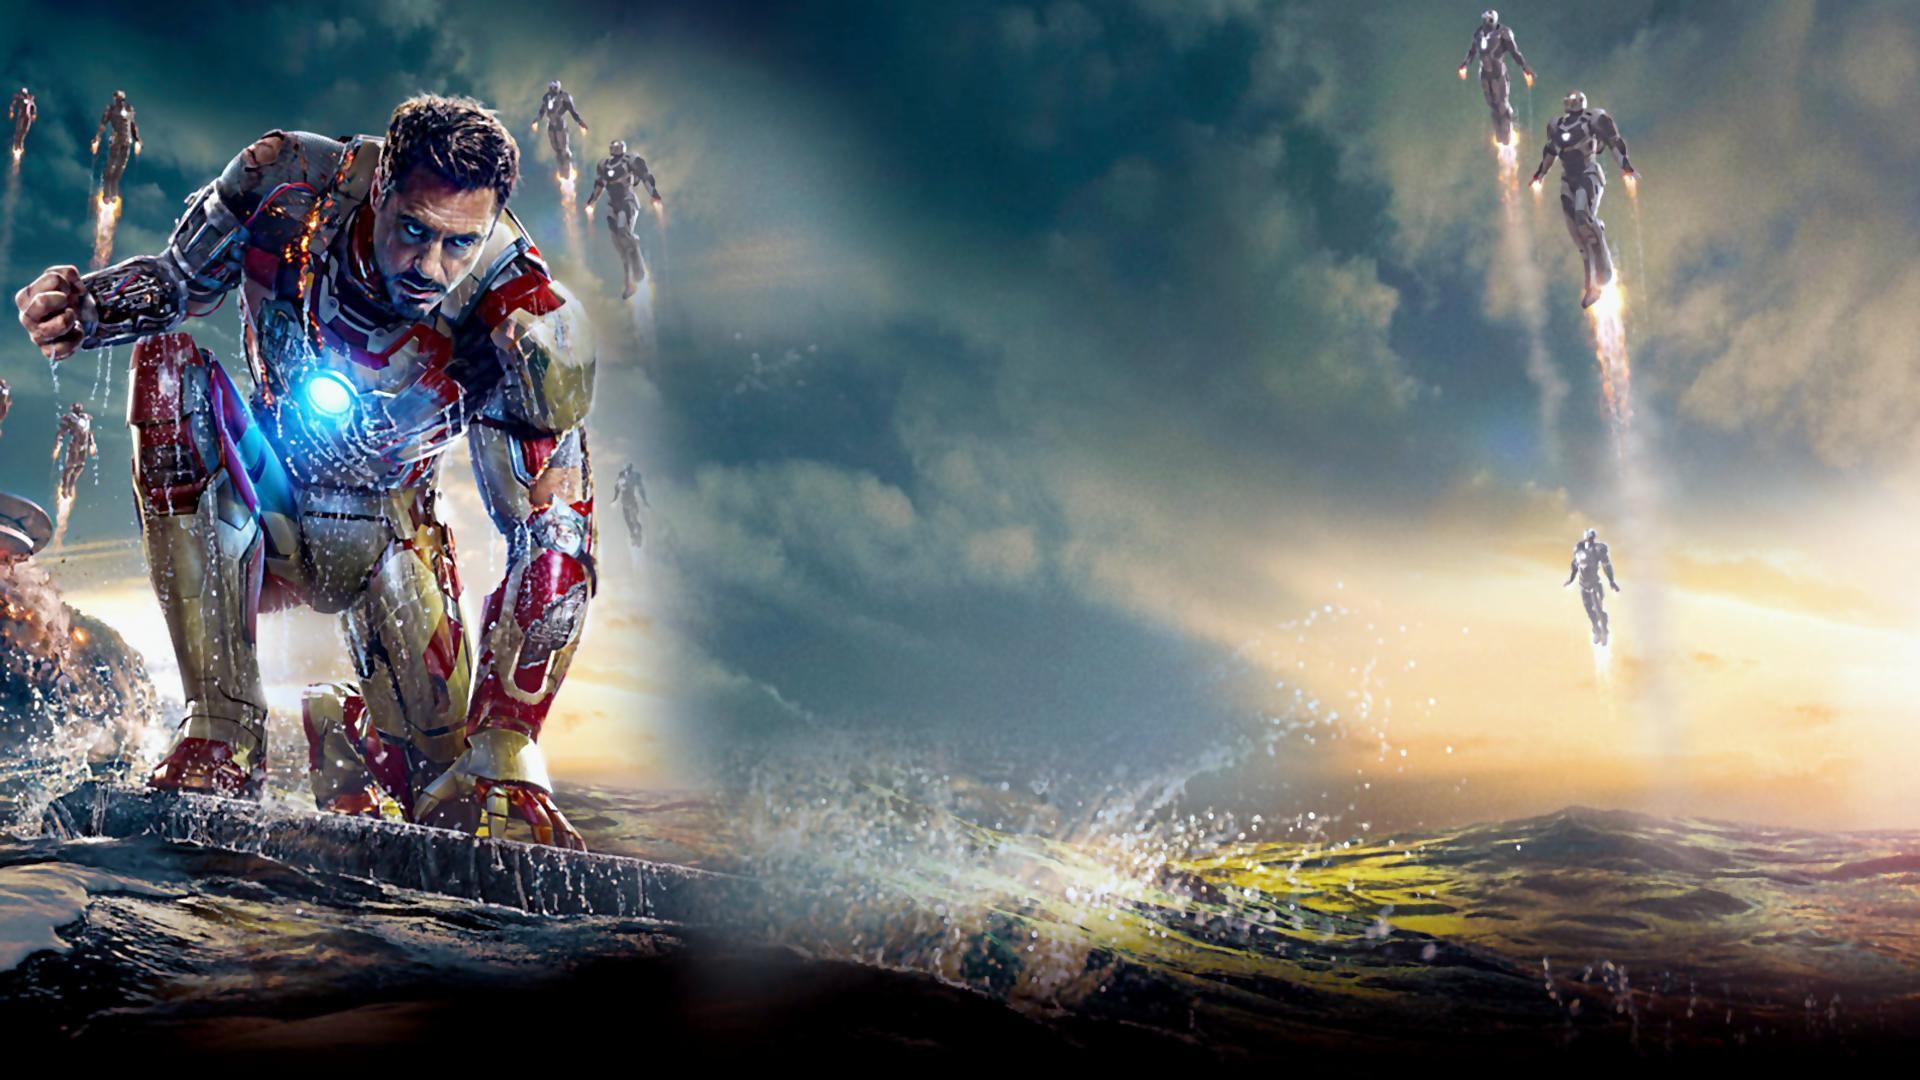 Iron man hd wallpaper.